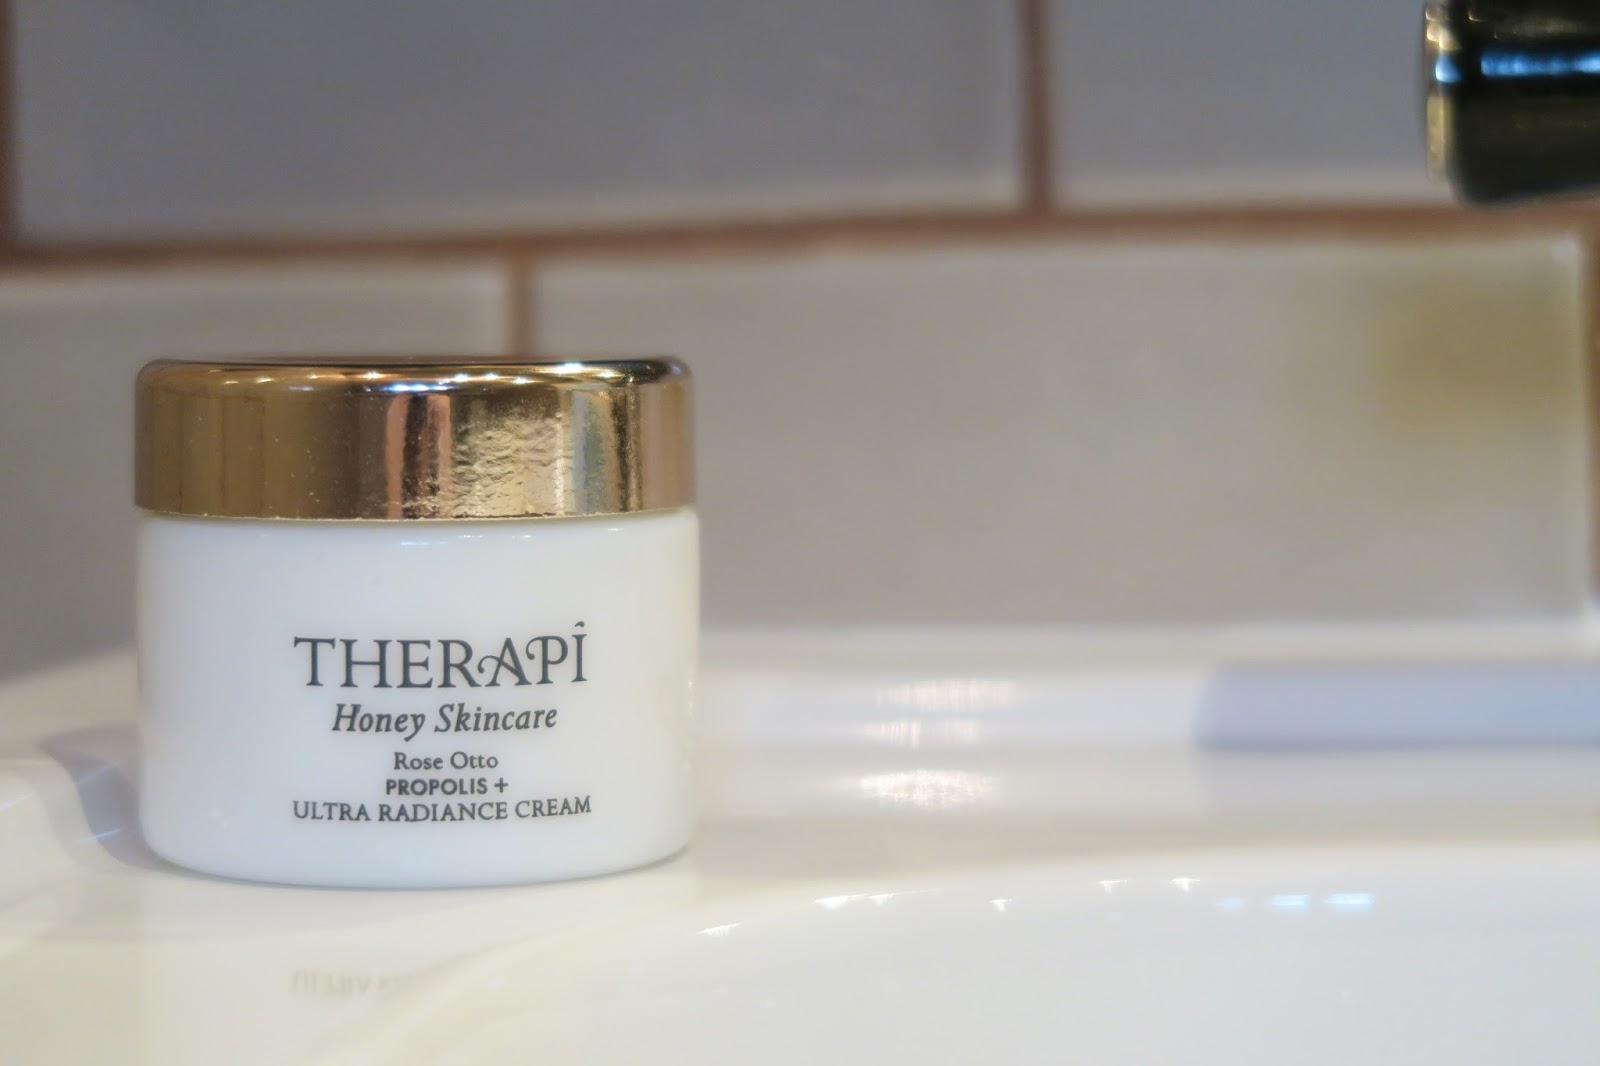 Natural organic skincare for oily blemish prone skin   Amber's Beauty Talk   Therapi Honey Skincare